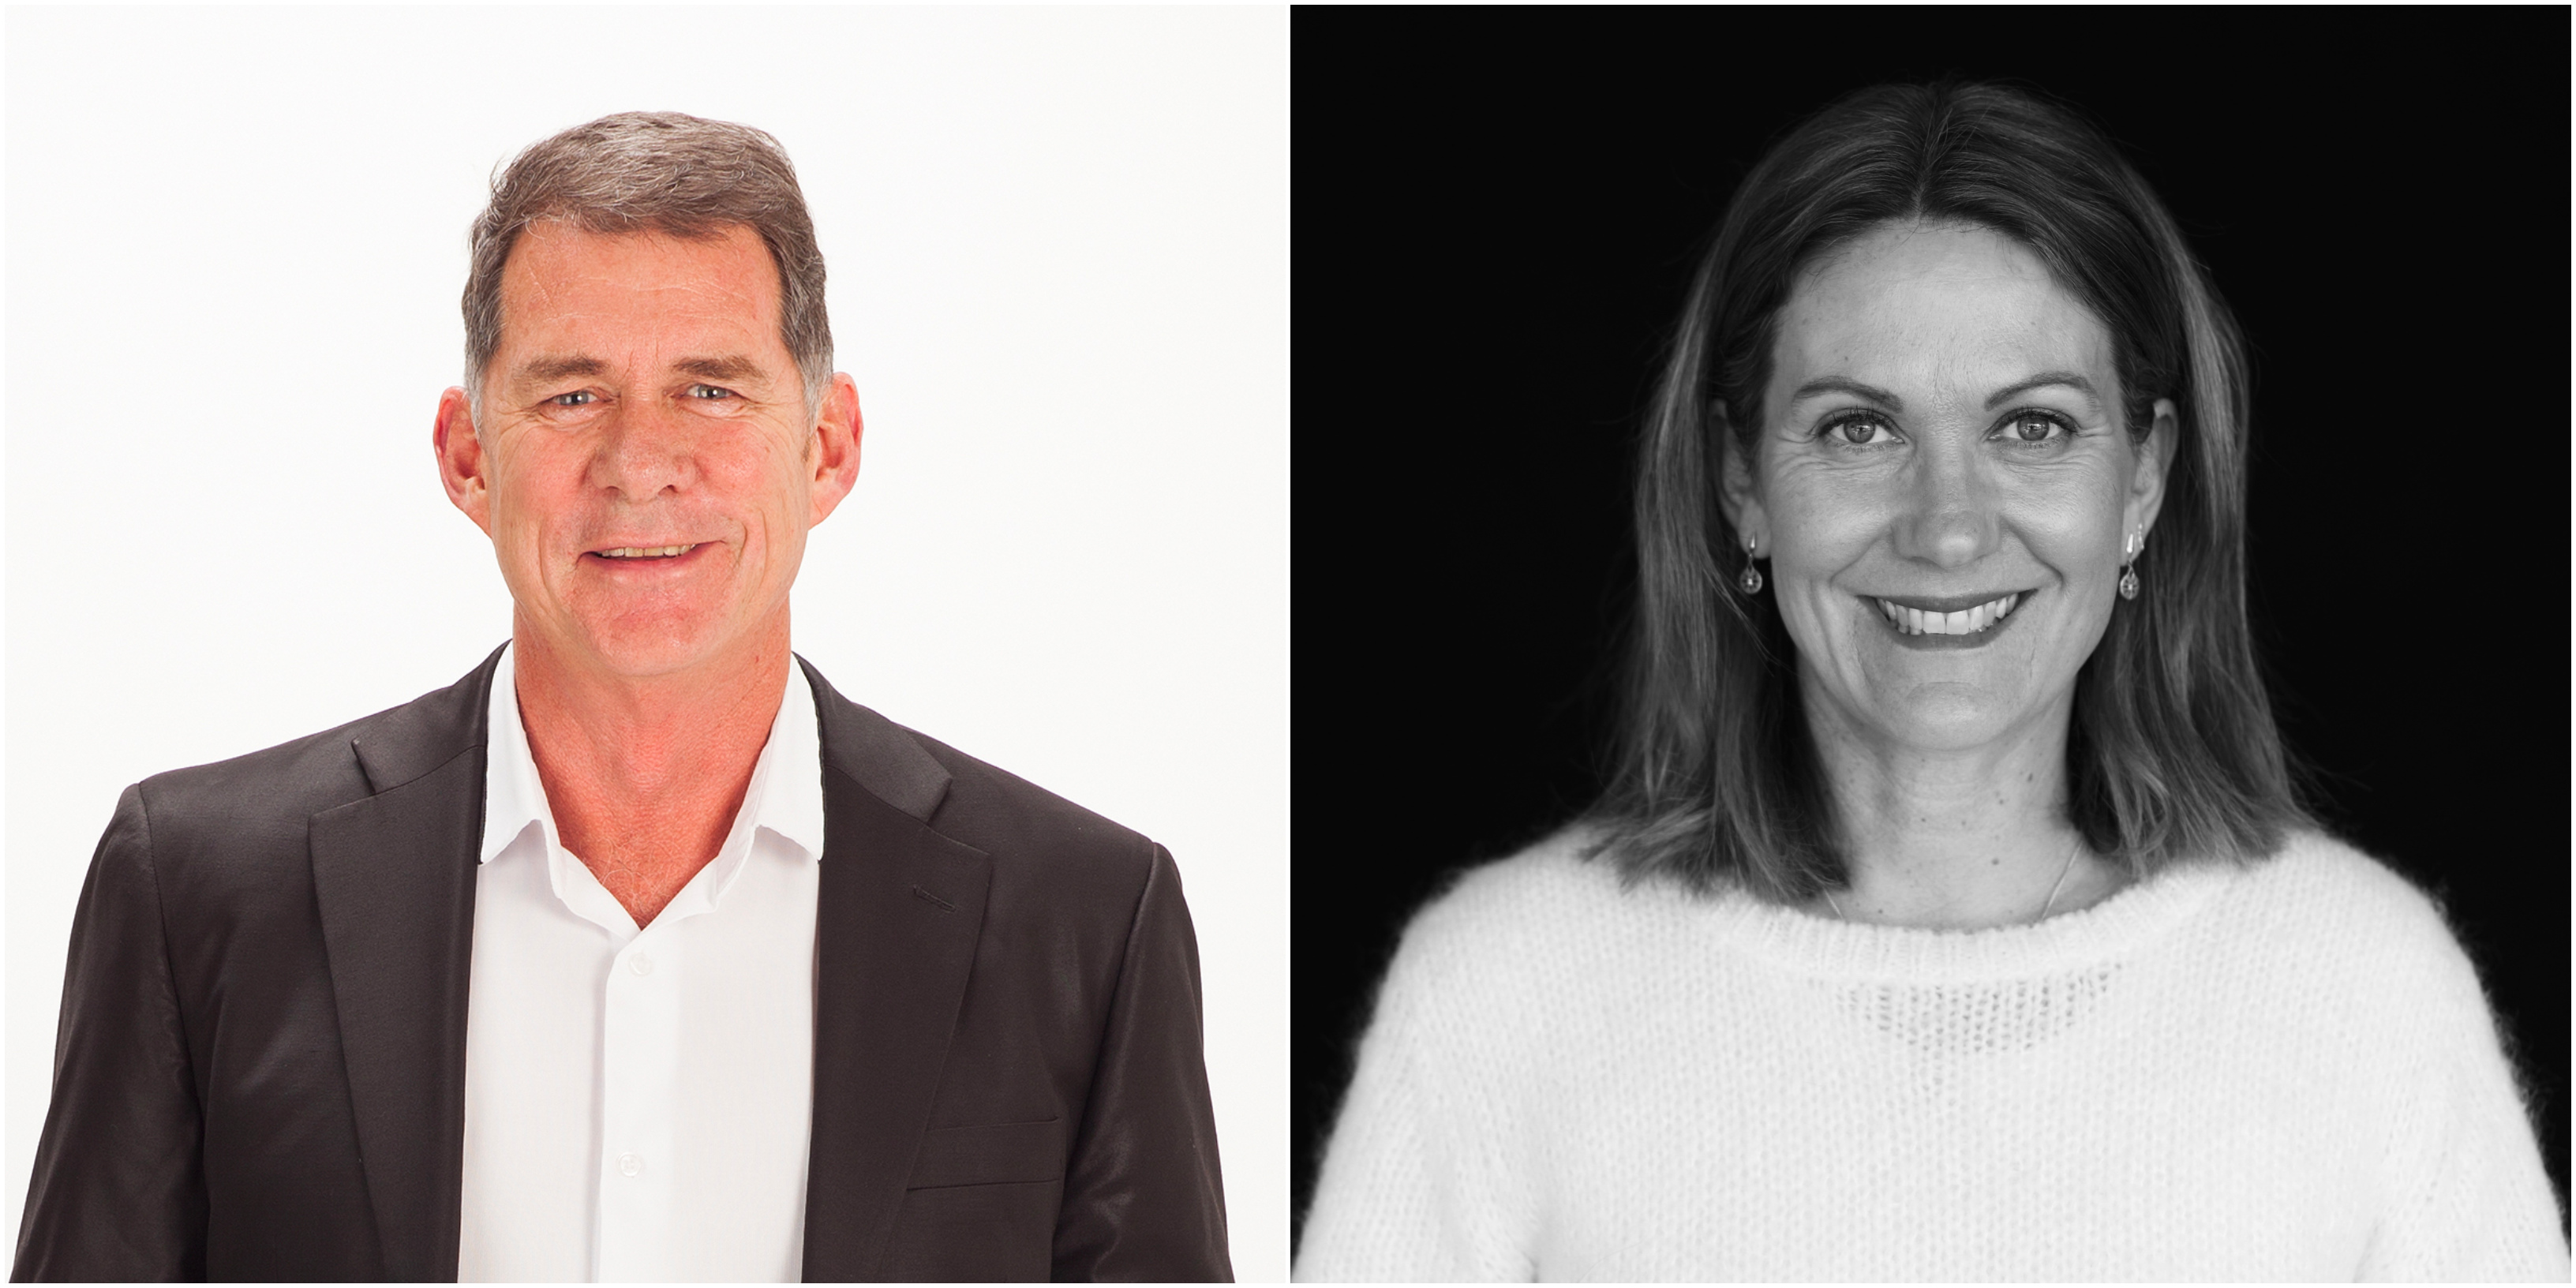 Richard Stevens to depart BrandWorld; Rachael Weaver appointed as new General Manager